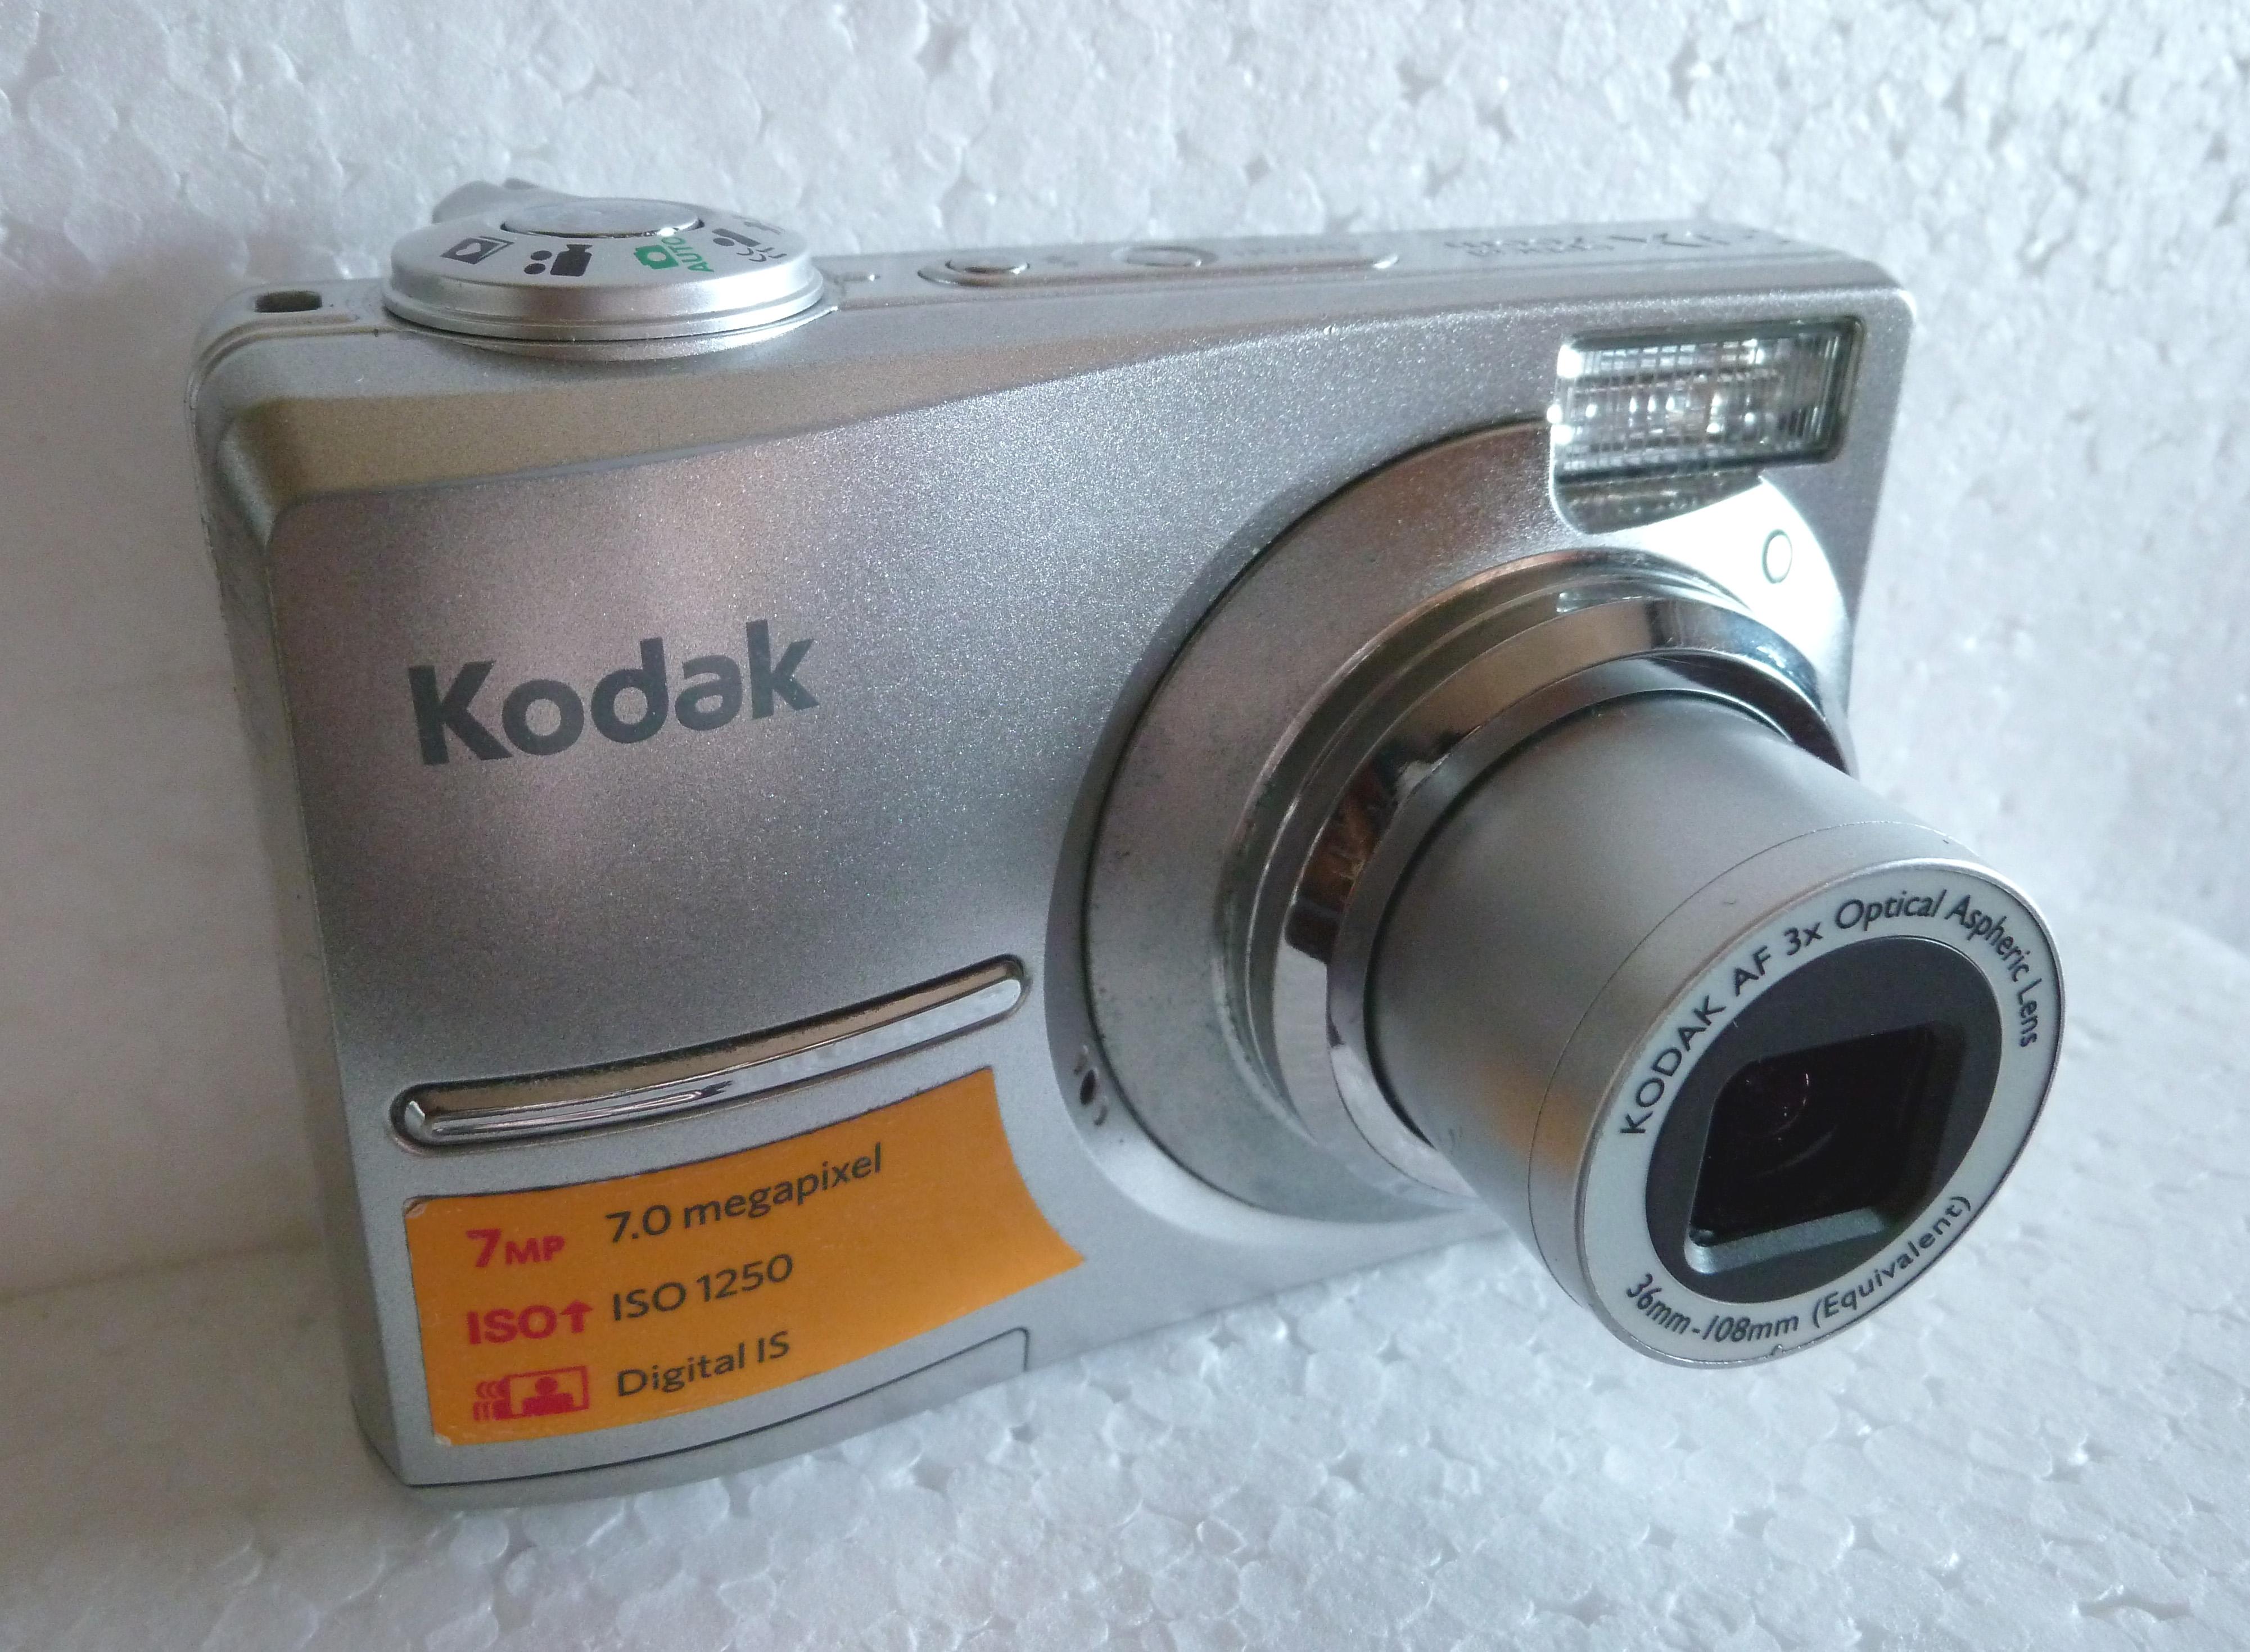 file kodak easyshare c713 camera 01 jpg wikimedia commons rh commons wikimedia org Kodak EasyShare C713 Manual Used Kodak EasyShare C713 Pink